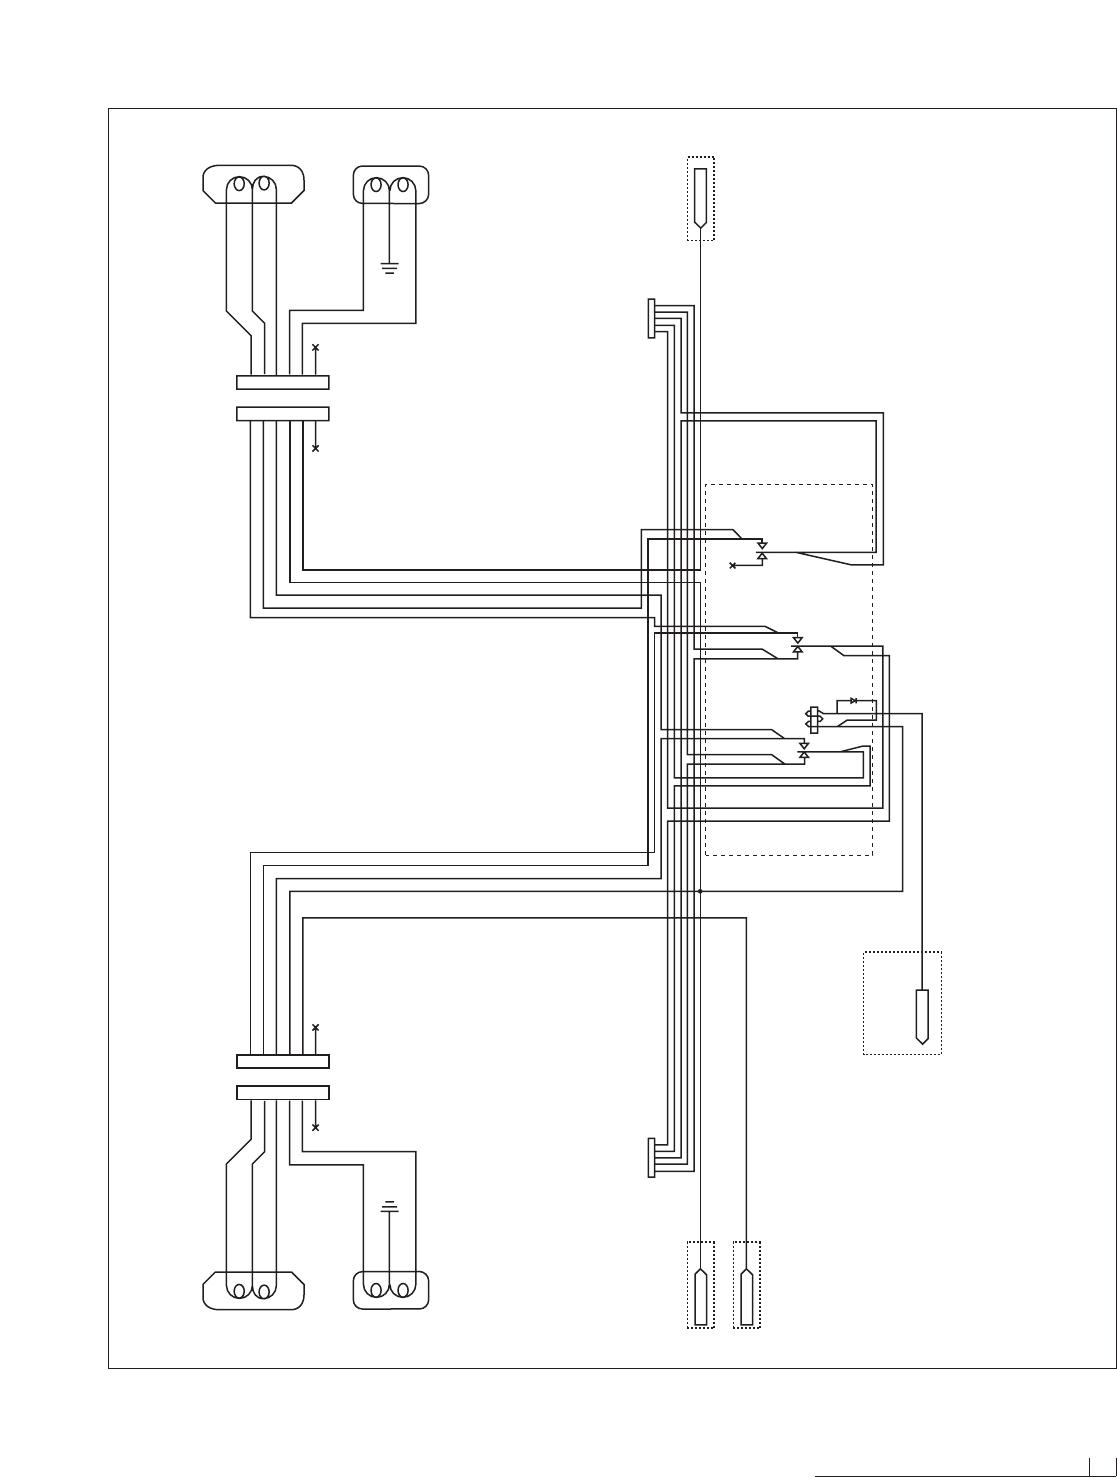 Main lighting harness wire schematic 29